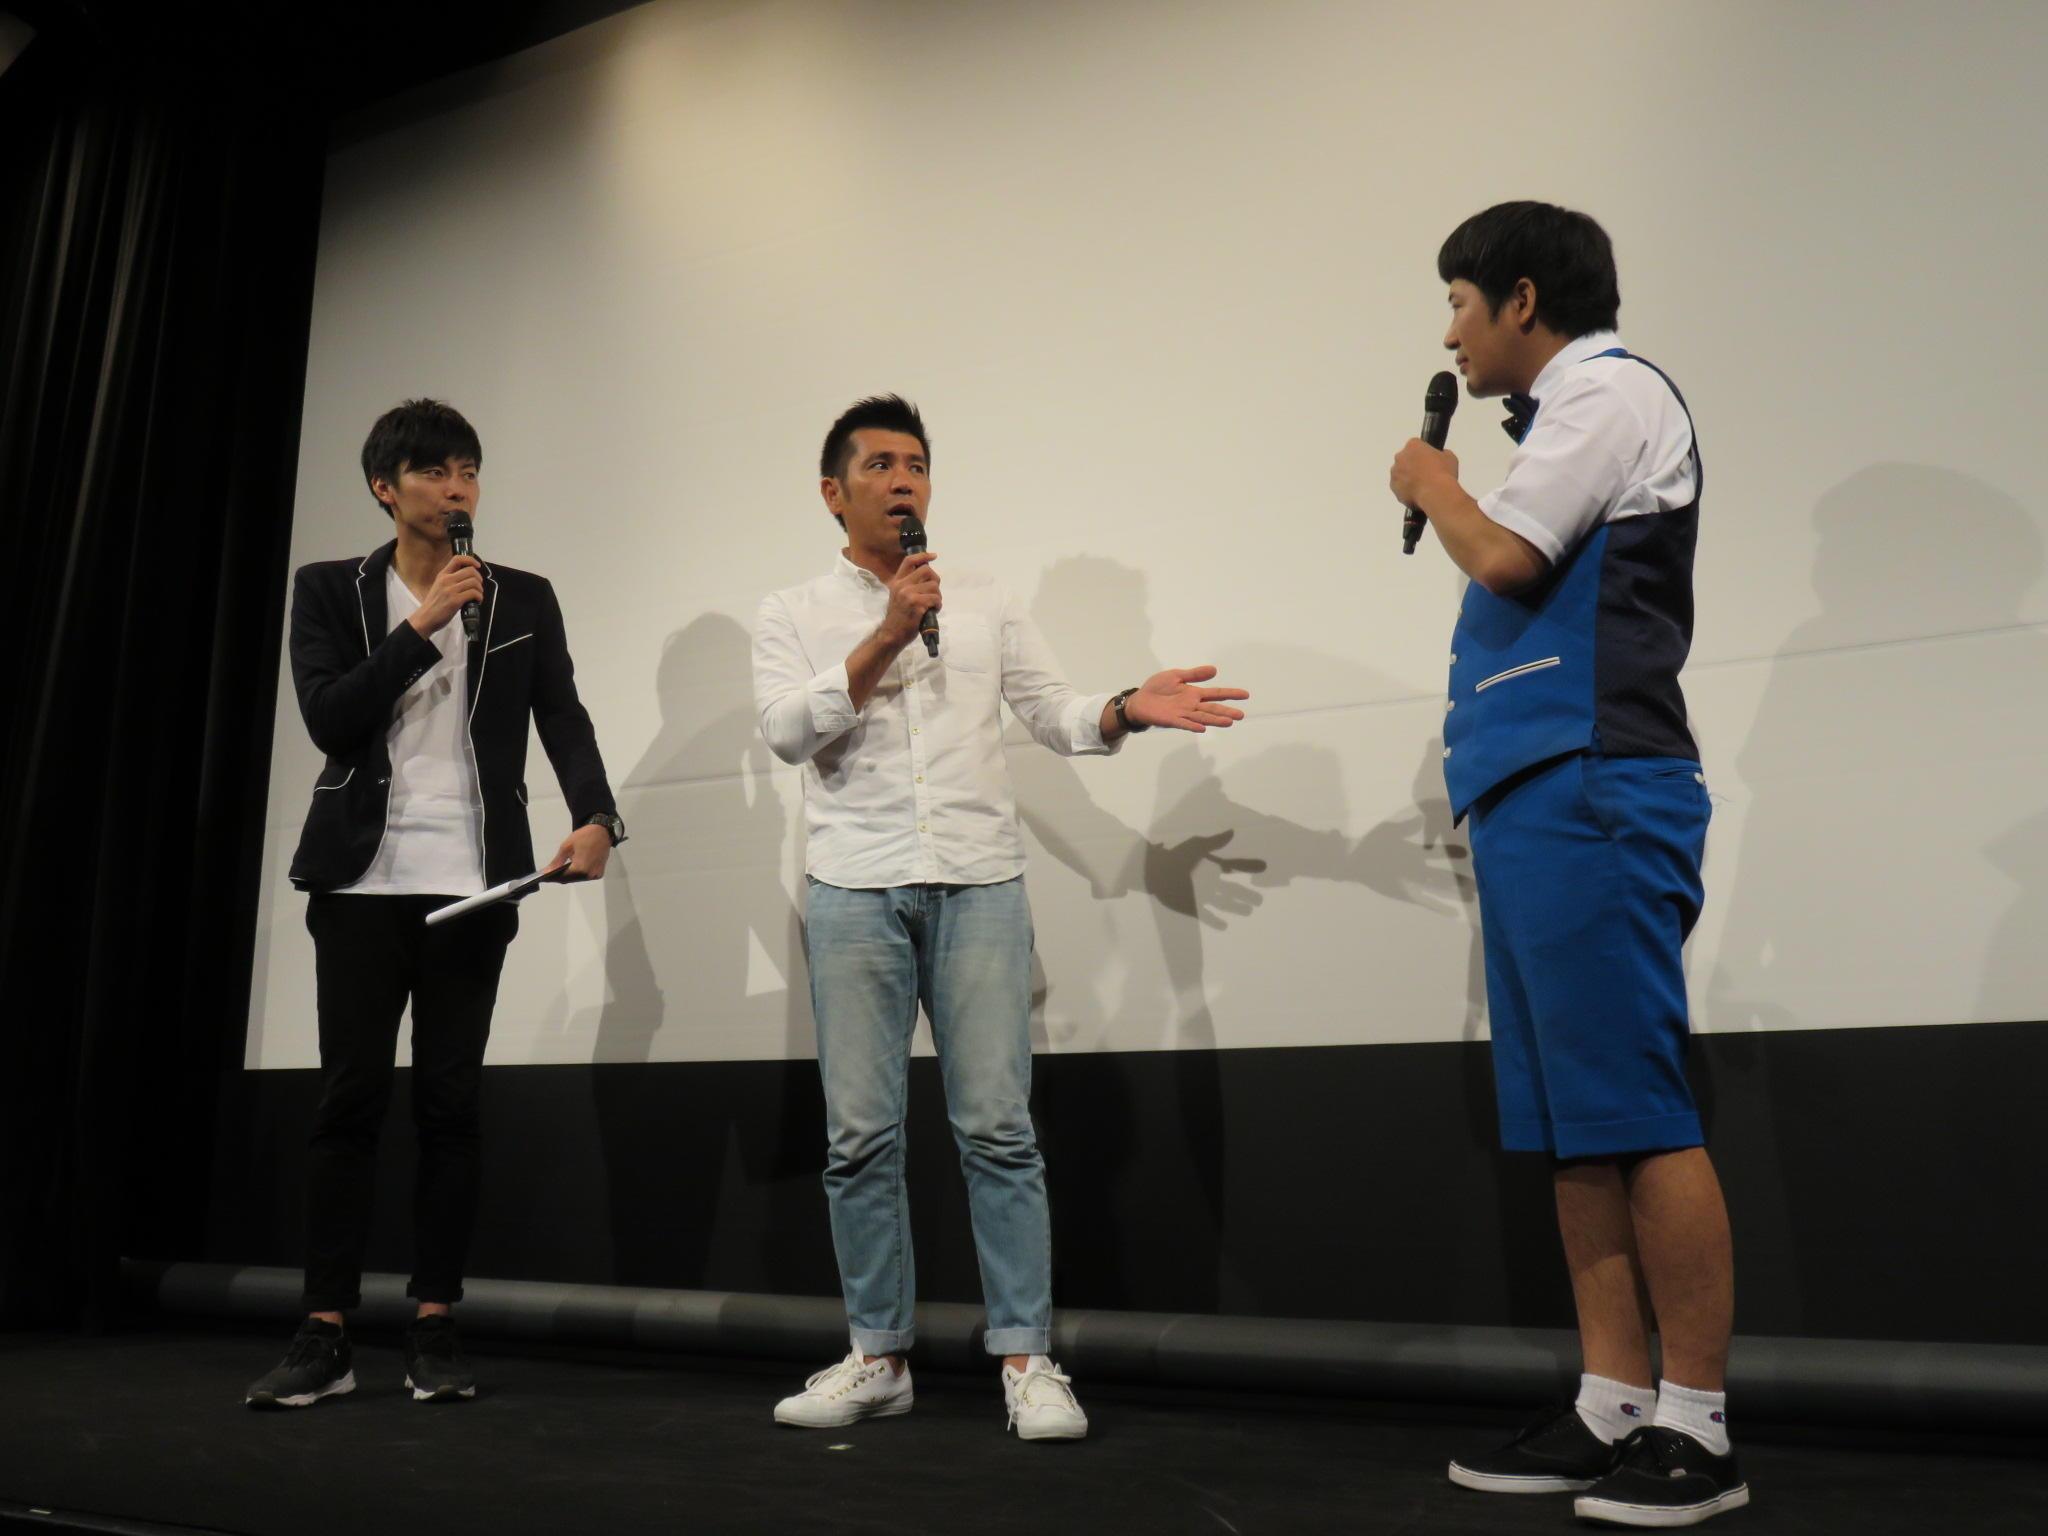 http://news.yoshimoto.co.jp/20170728223331-0e38f383f1b5227b383756fddeef3b46a5d4cb6c.jpg